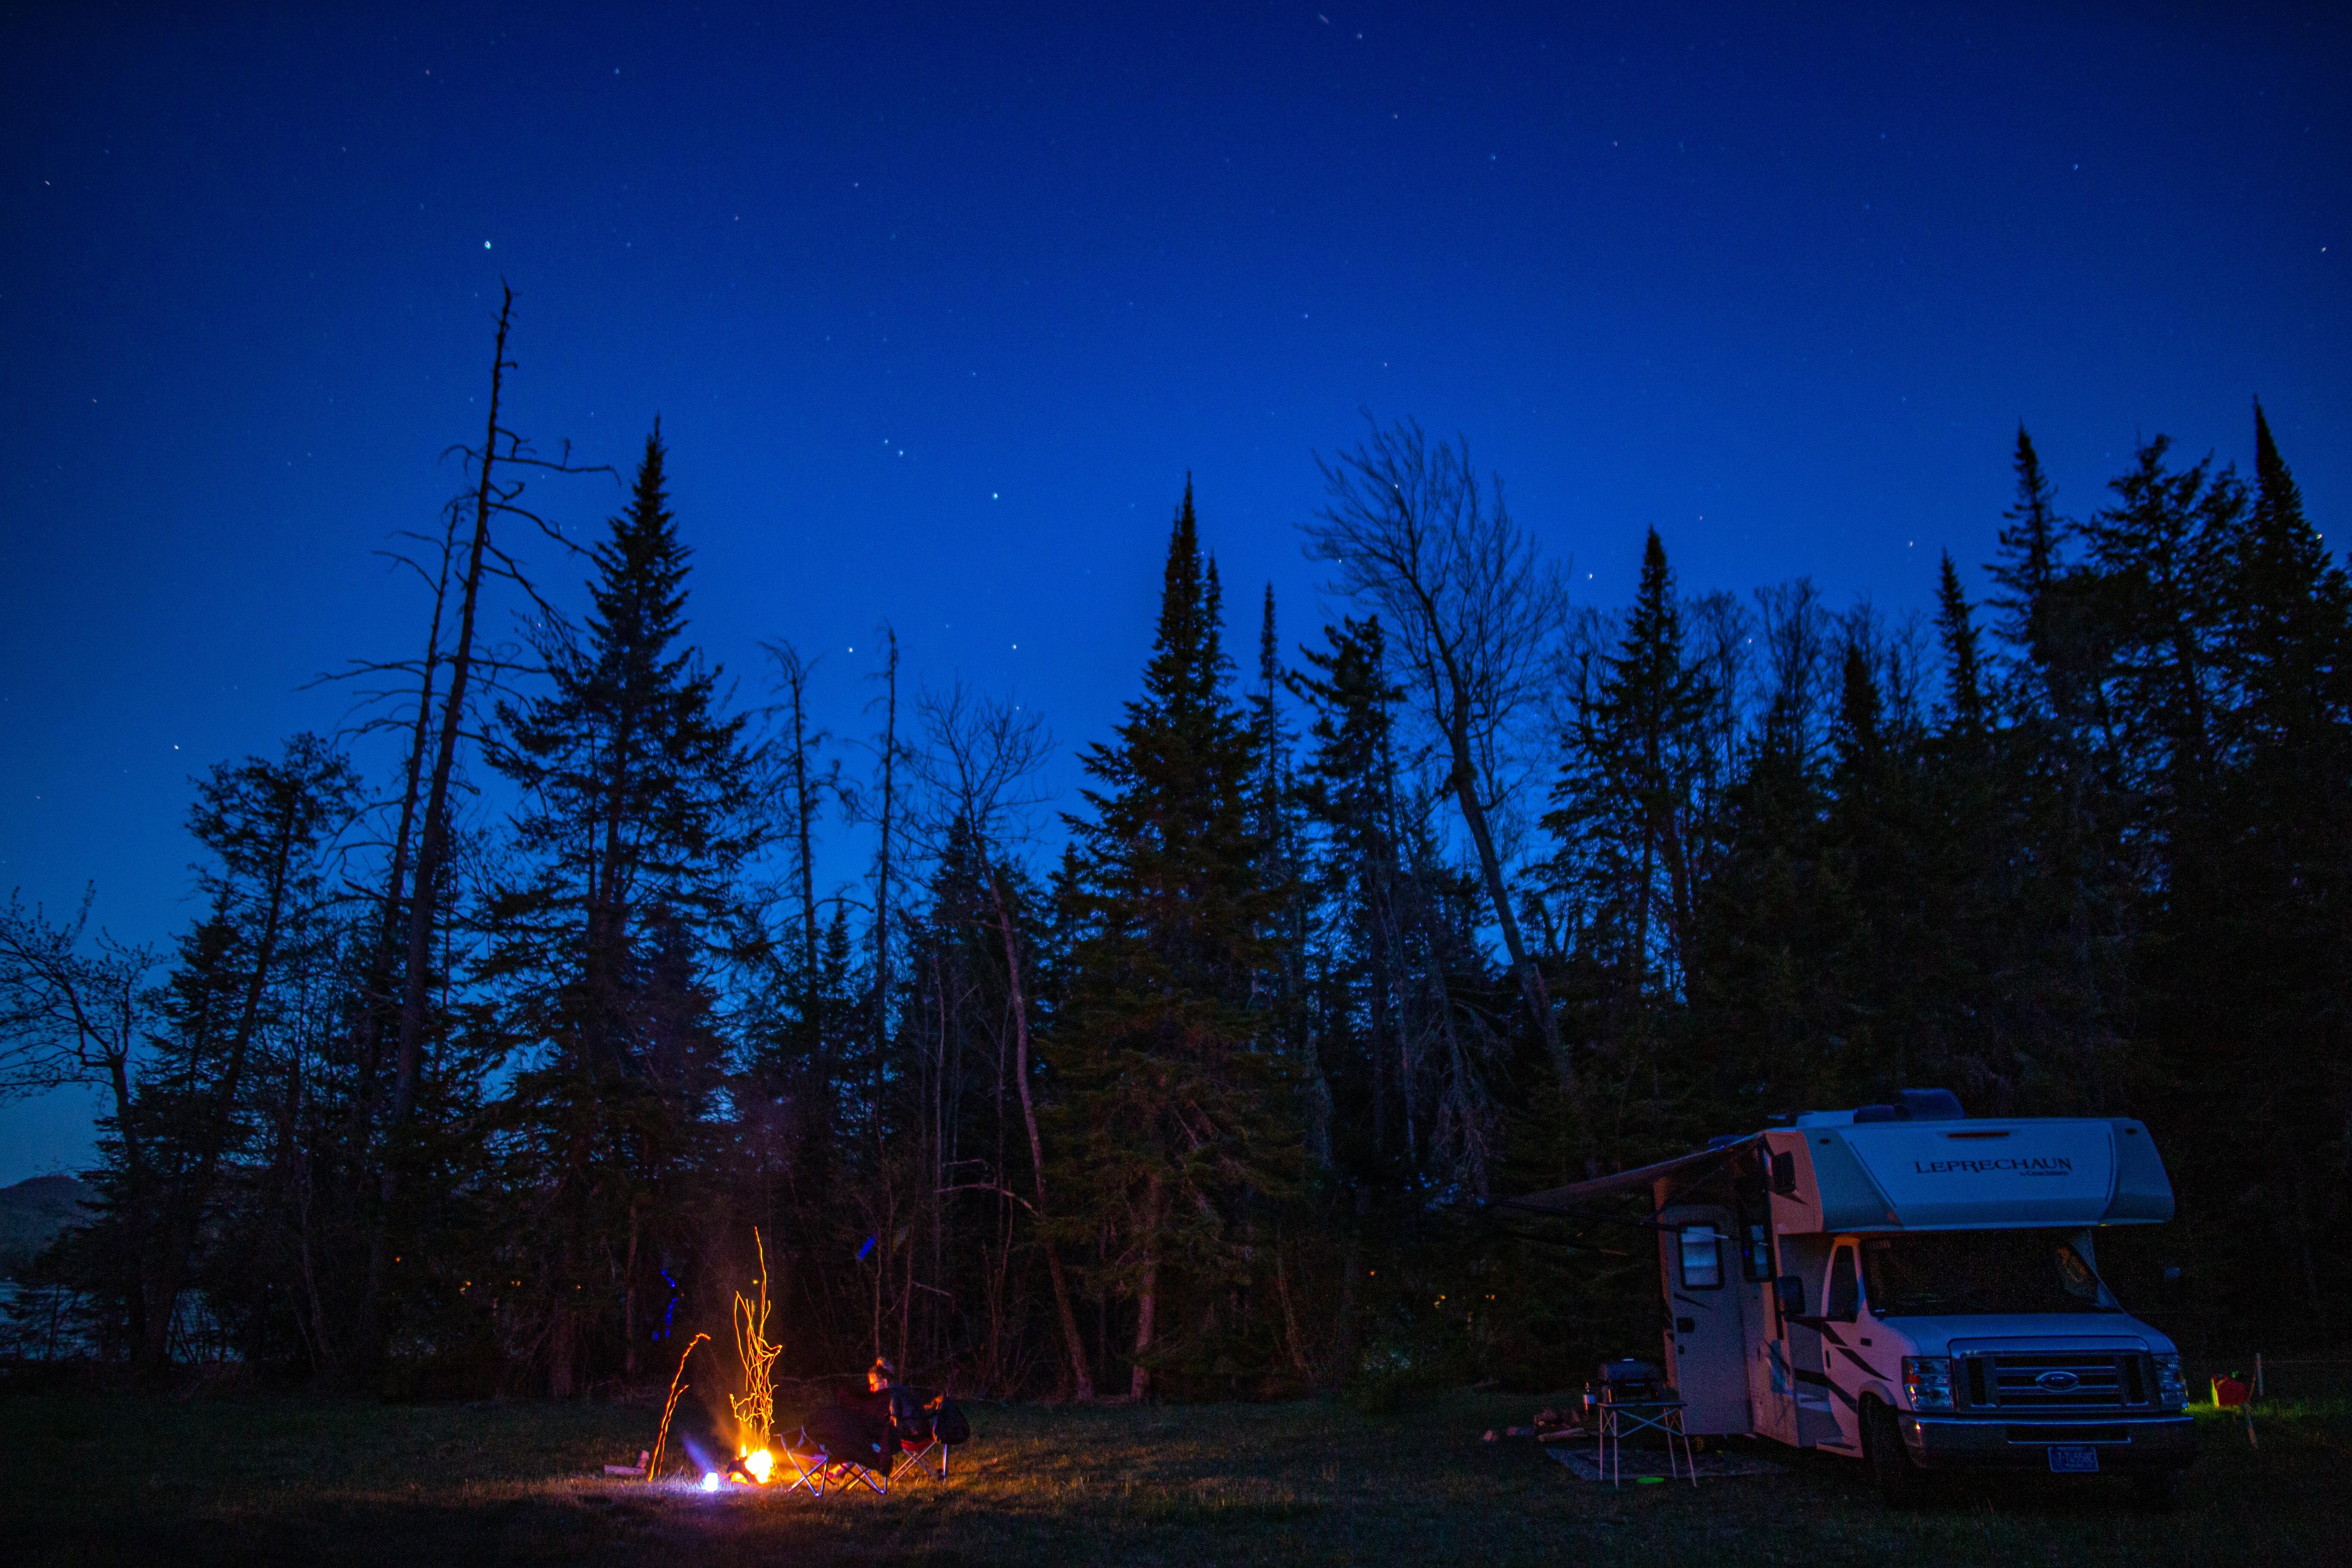 Camping under the stars. Coachmen Leprechaun 2018